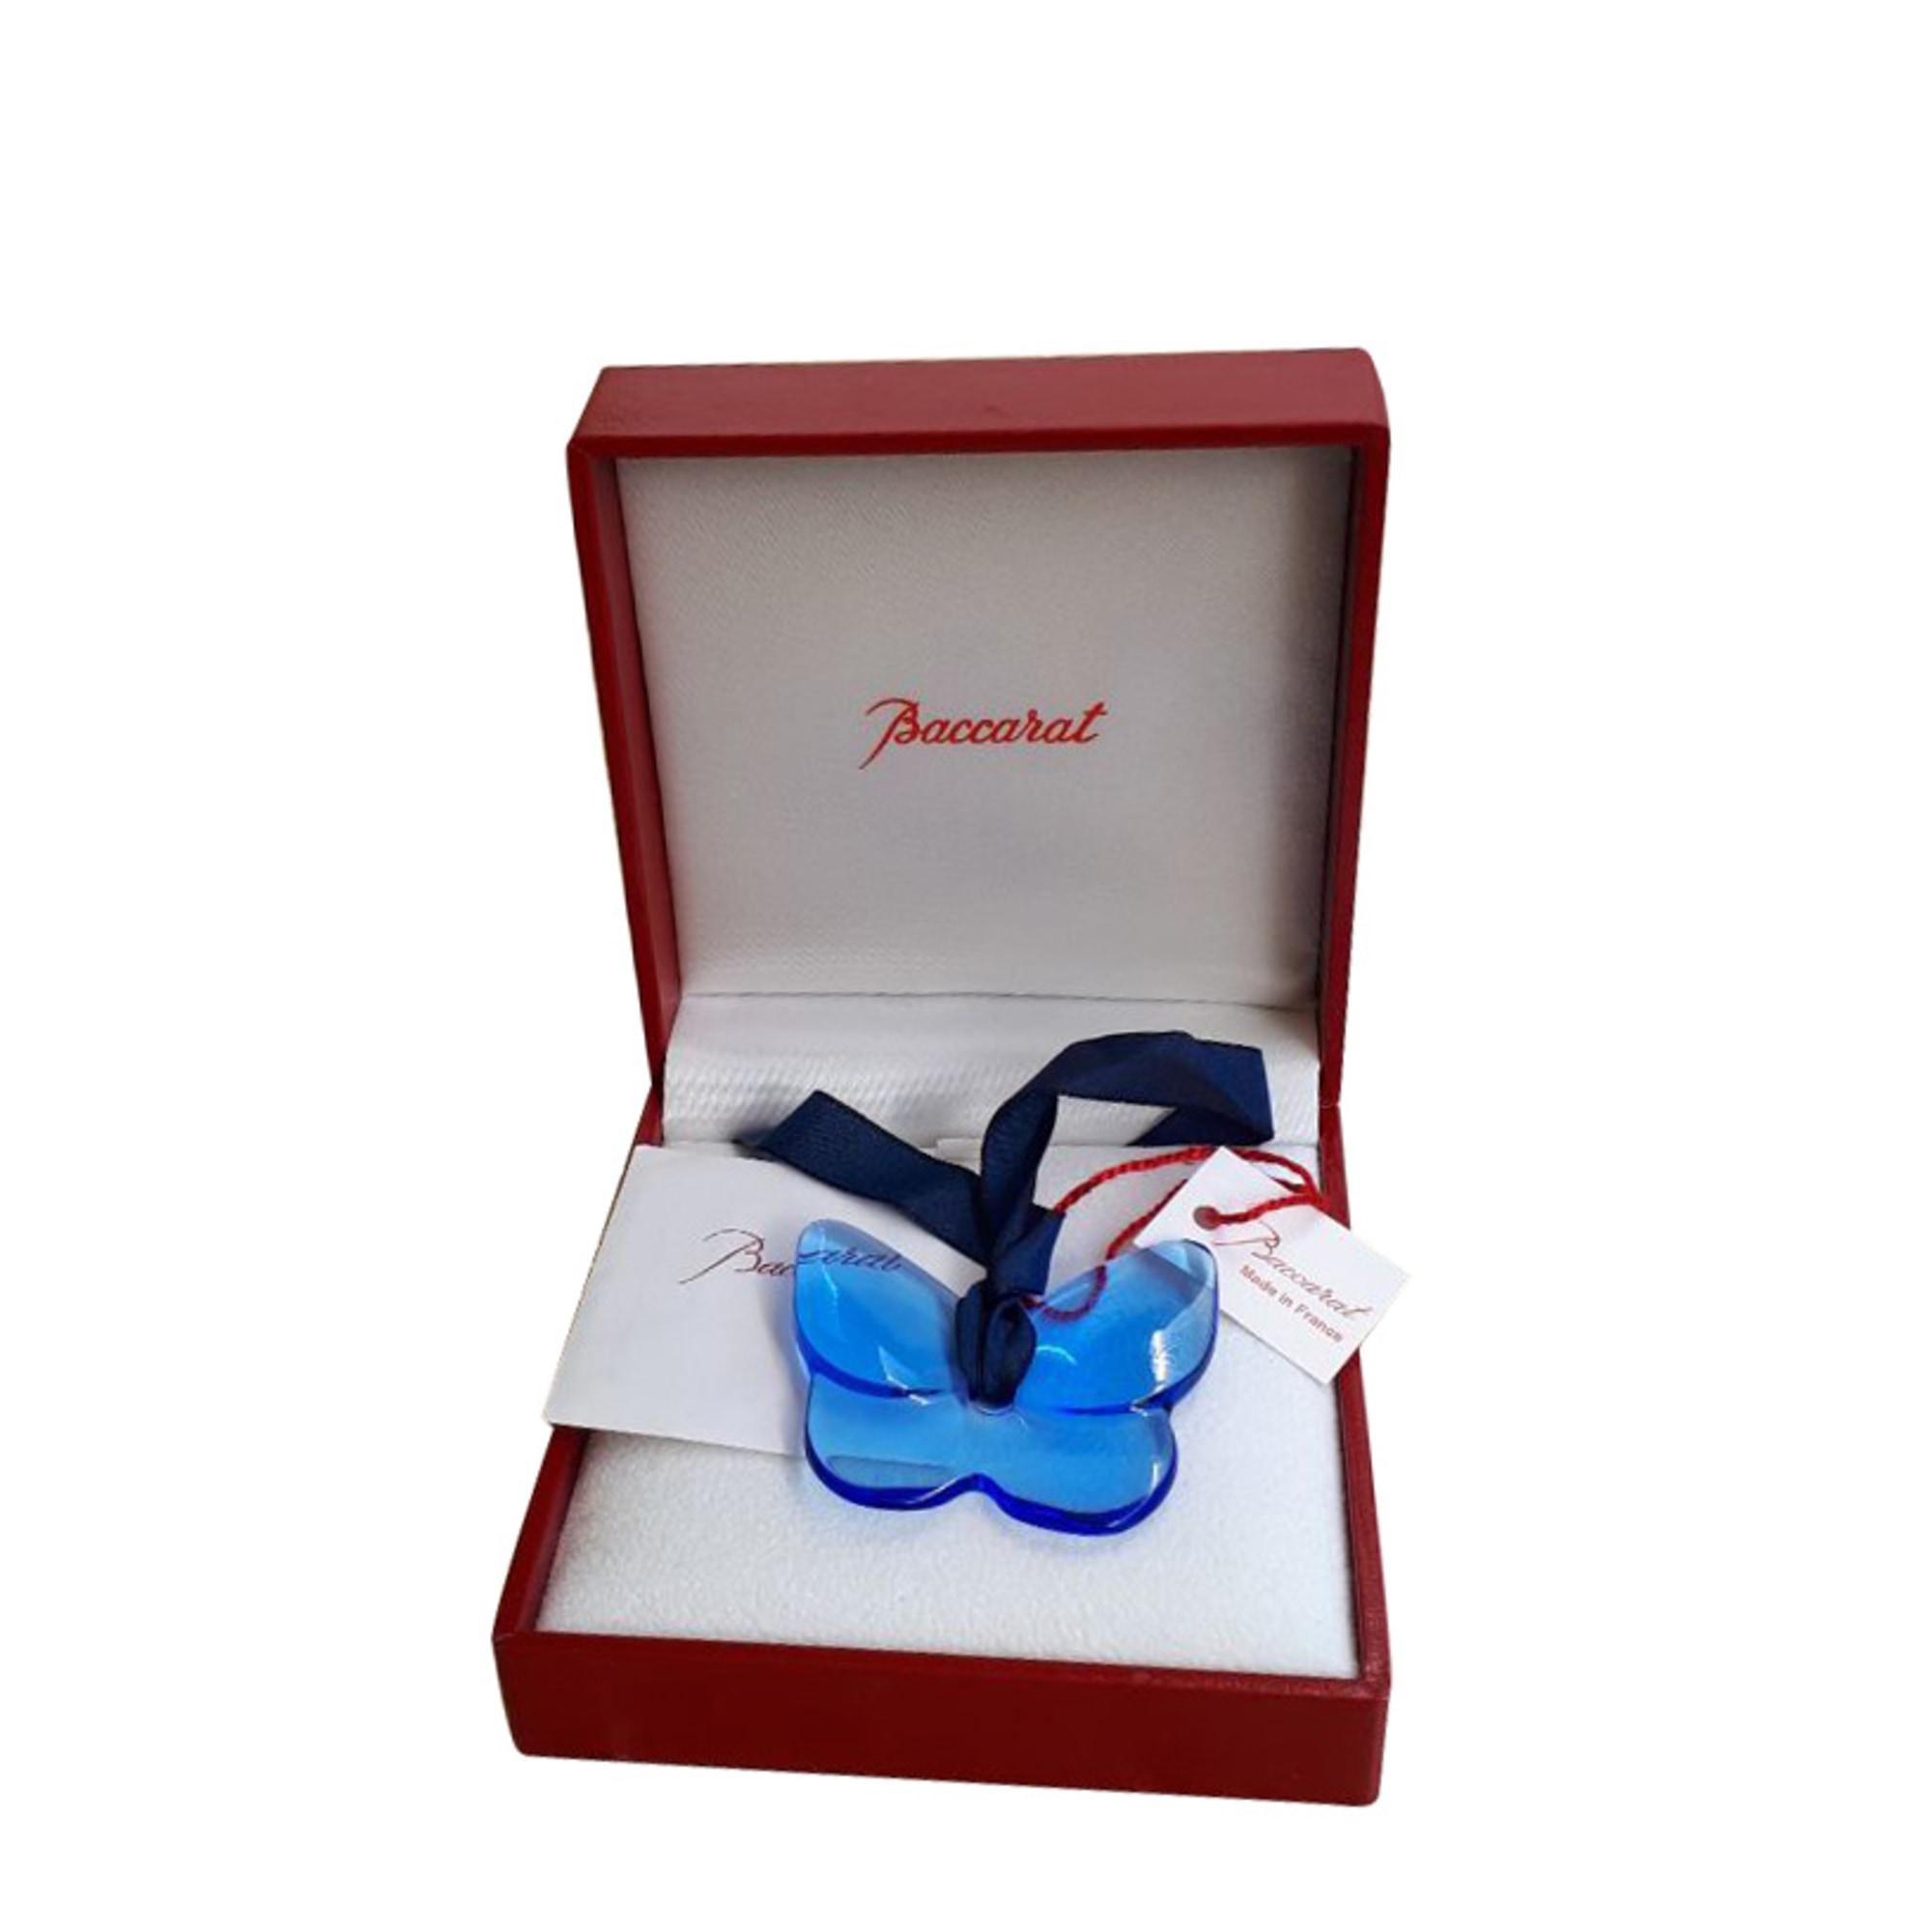 Pendentif, collier pendentif BACCARAT Bleu, bleu marine, bleu turquoise